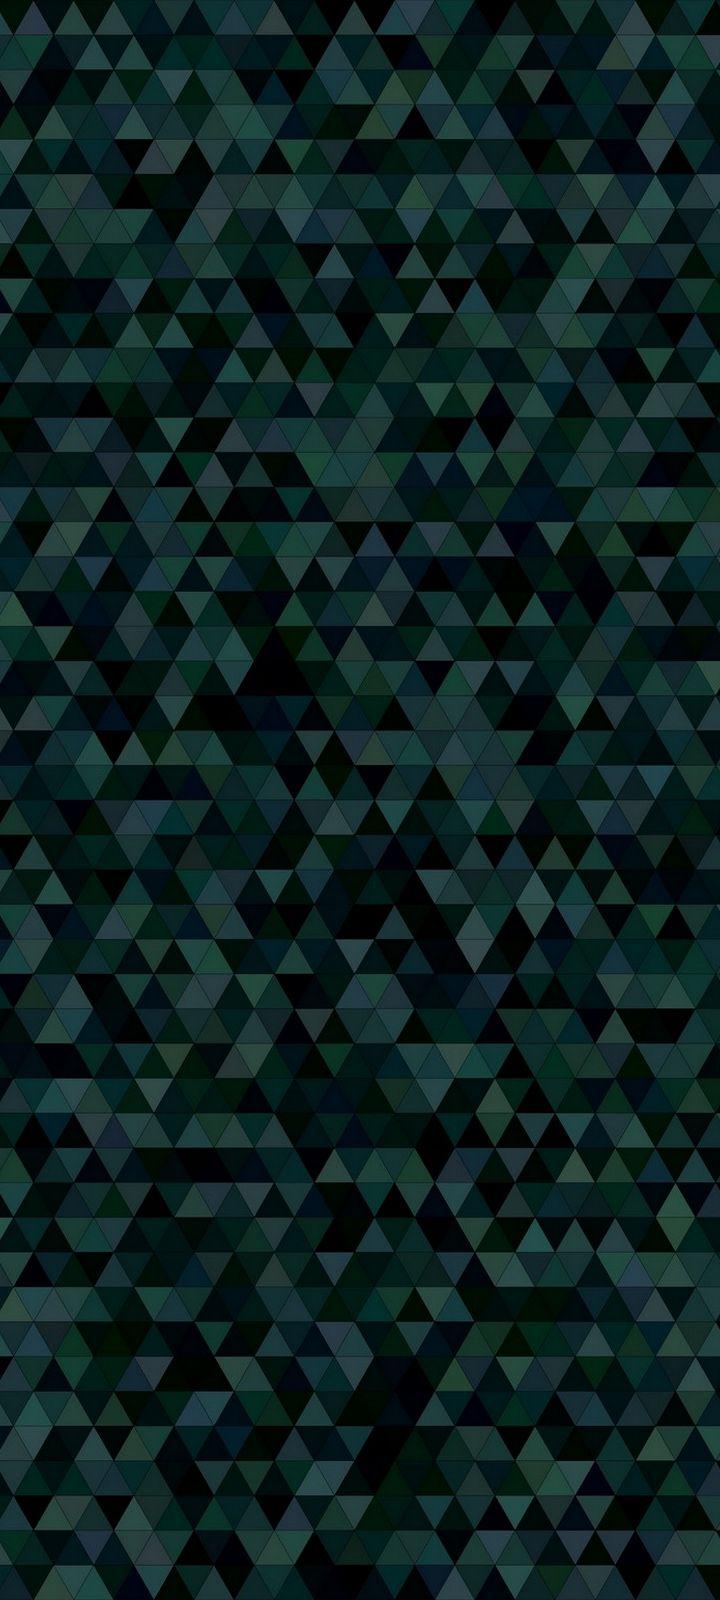 Triangles Mosaic Dark Texture Wallpaper 720x1600